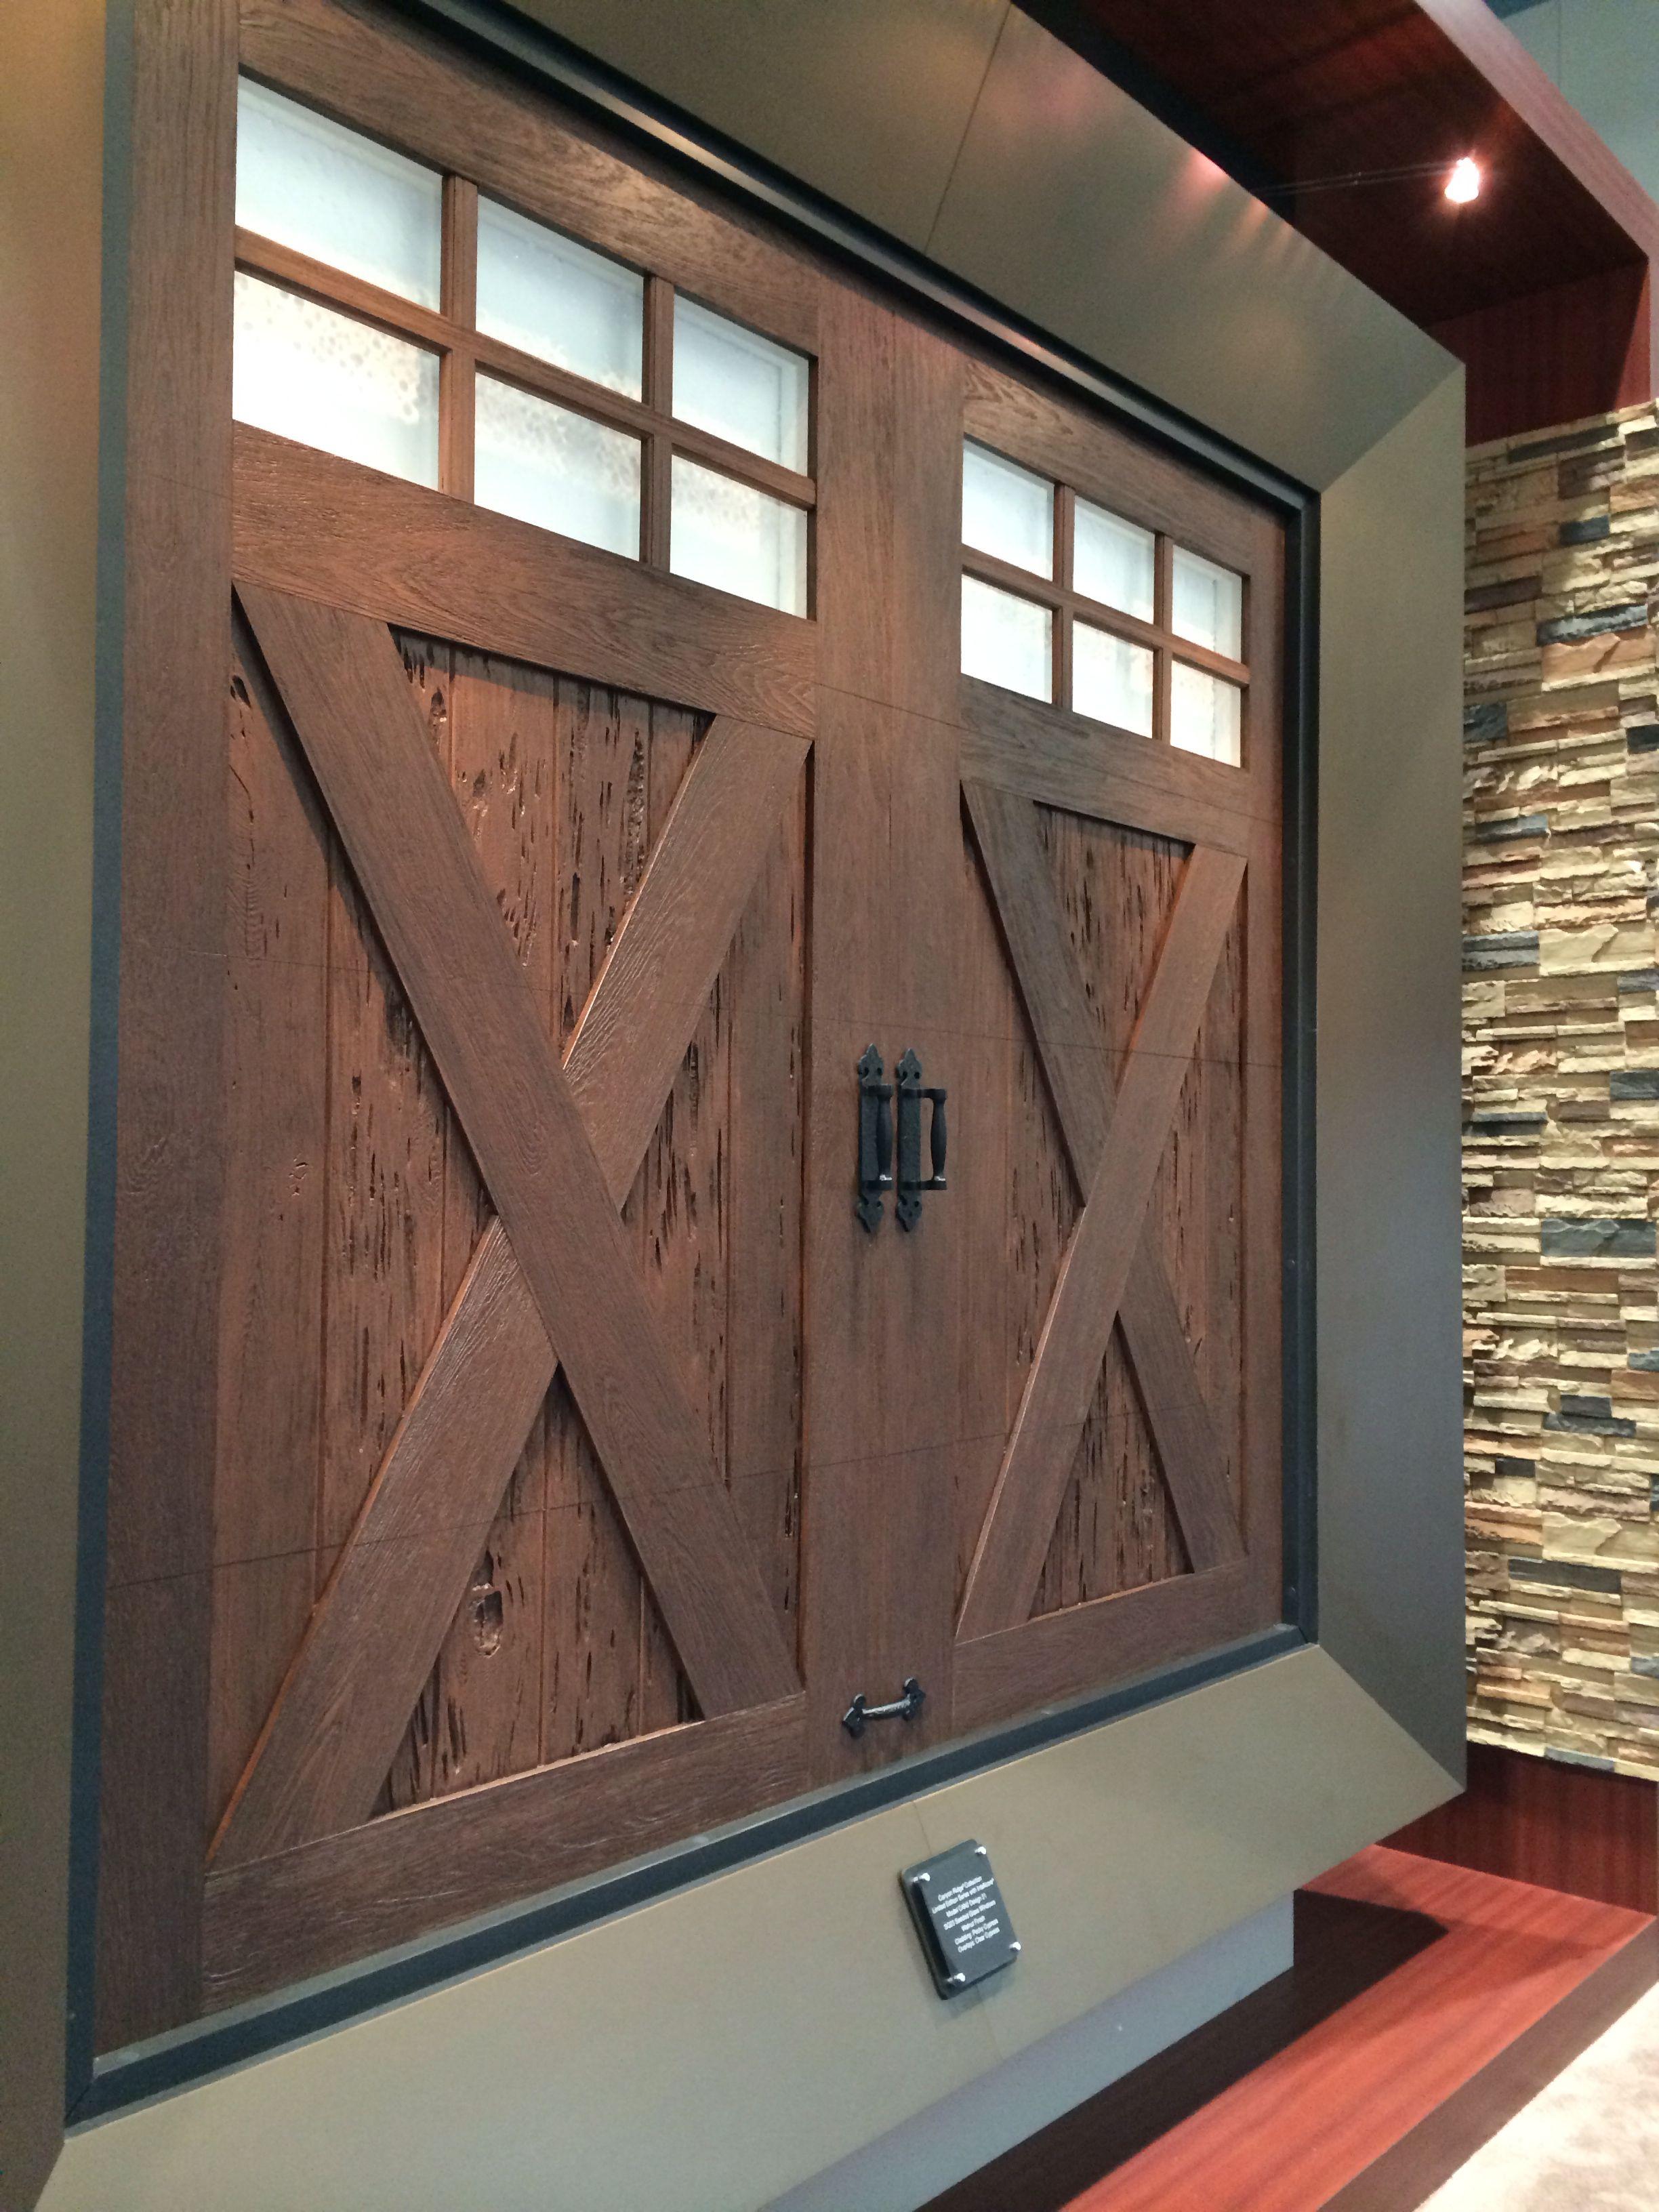 Garage door windows that open  Clopay Canyon Ridge Collection faux wood carriage style garage door